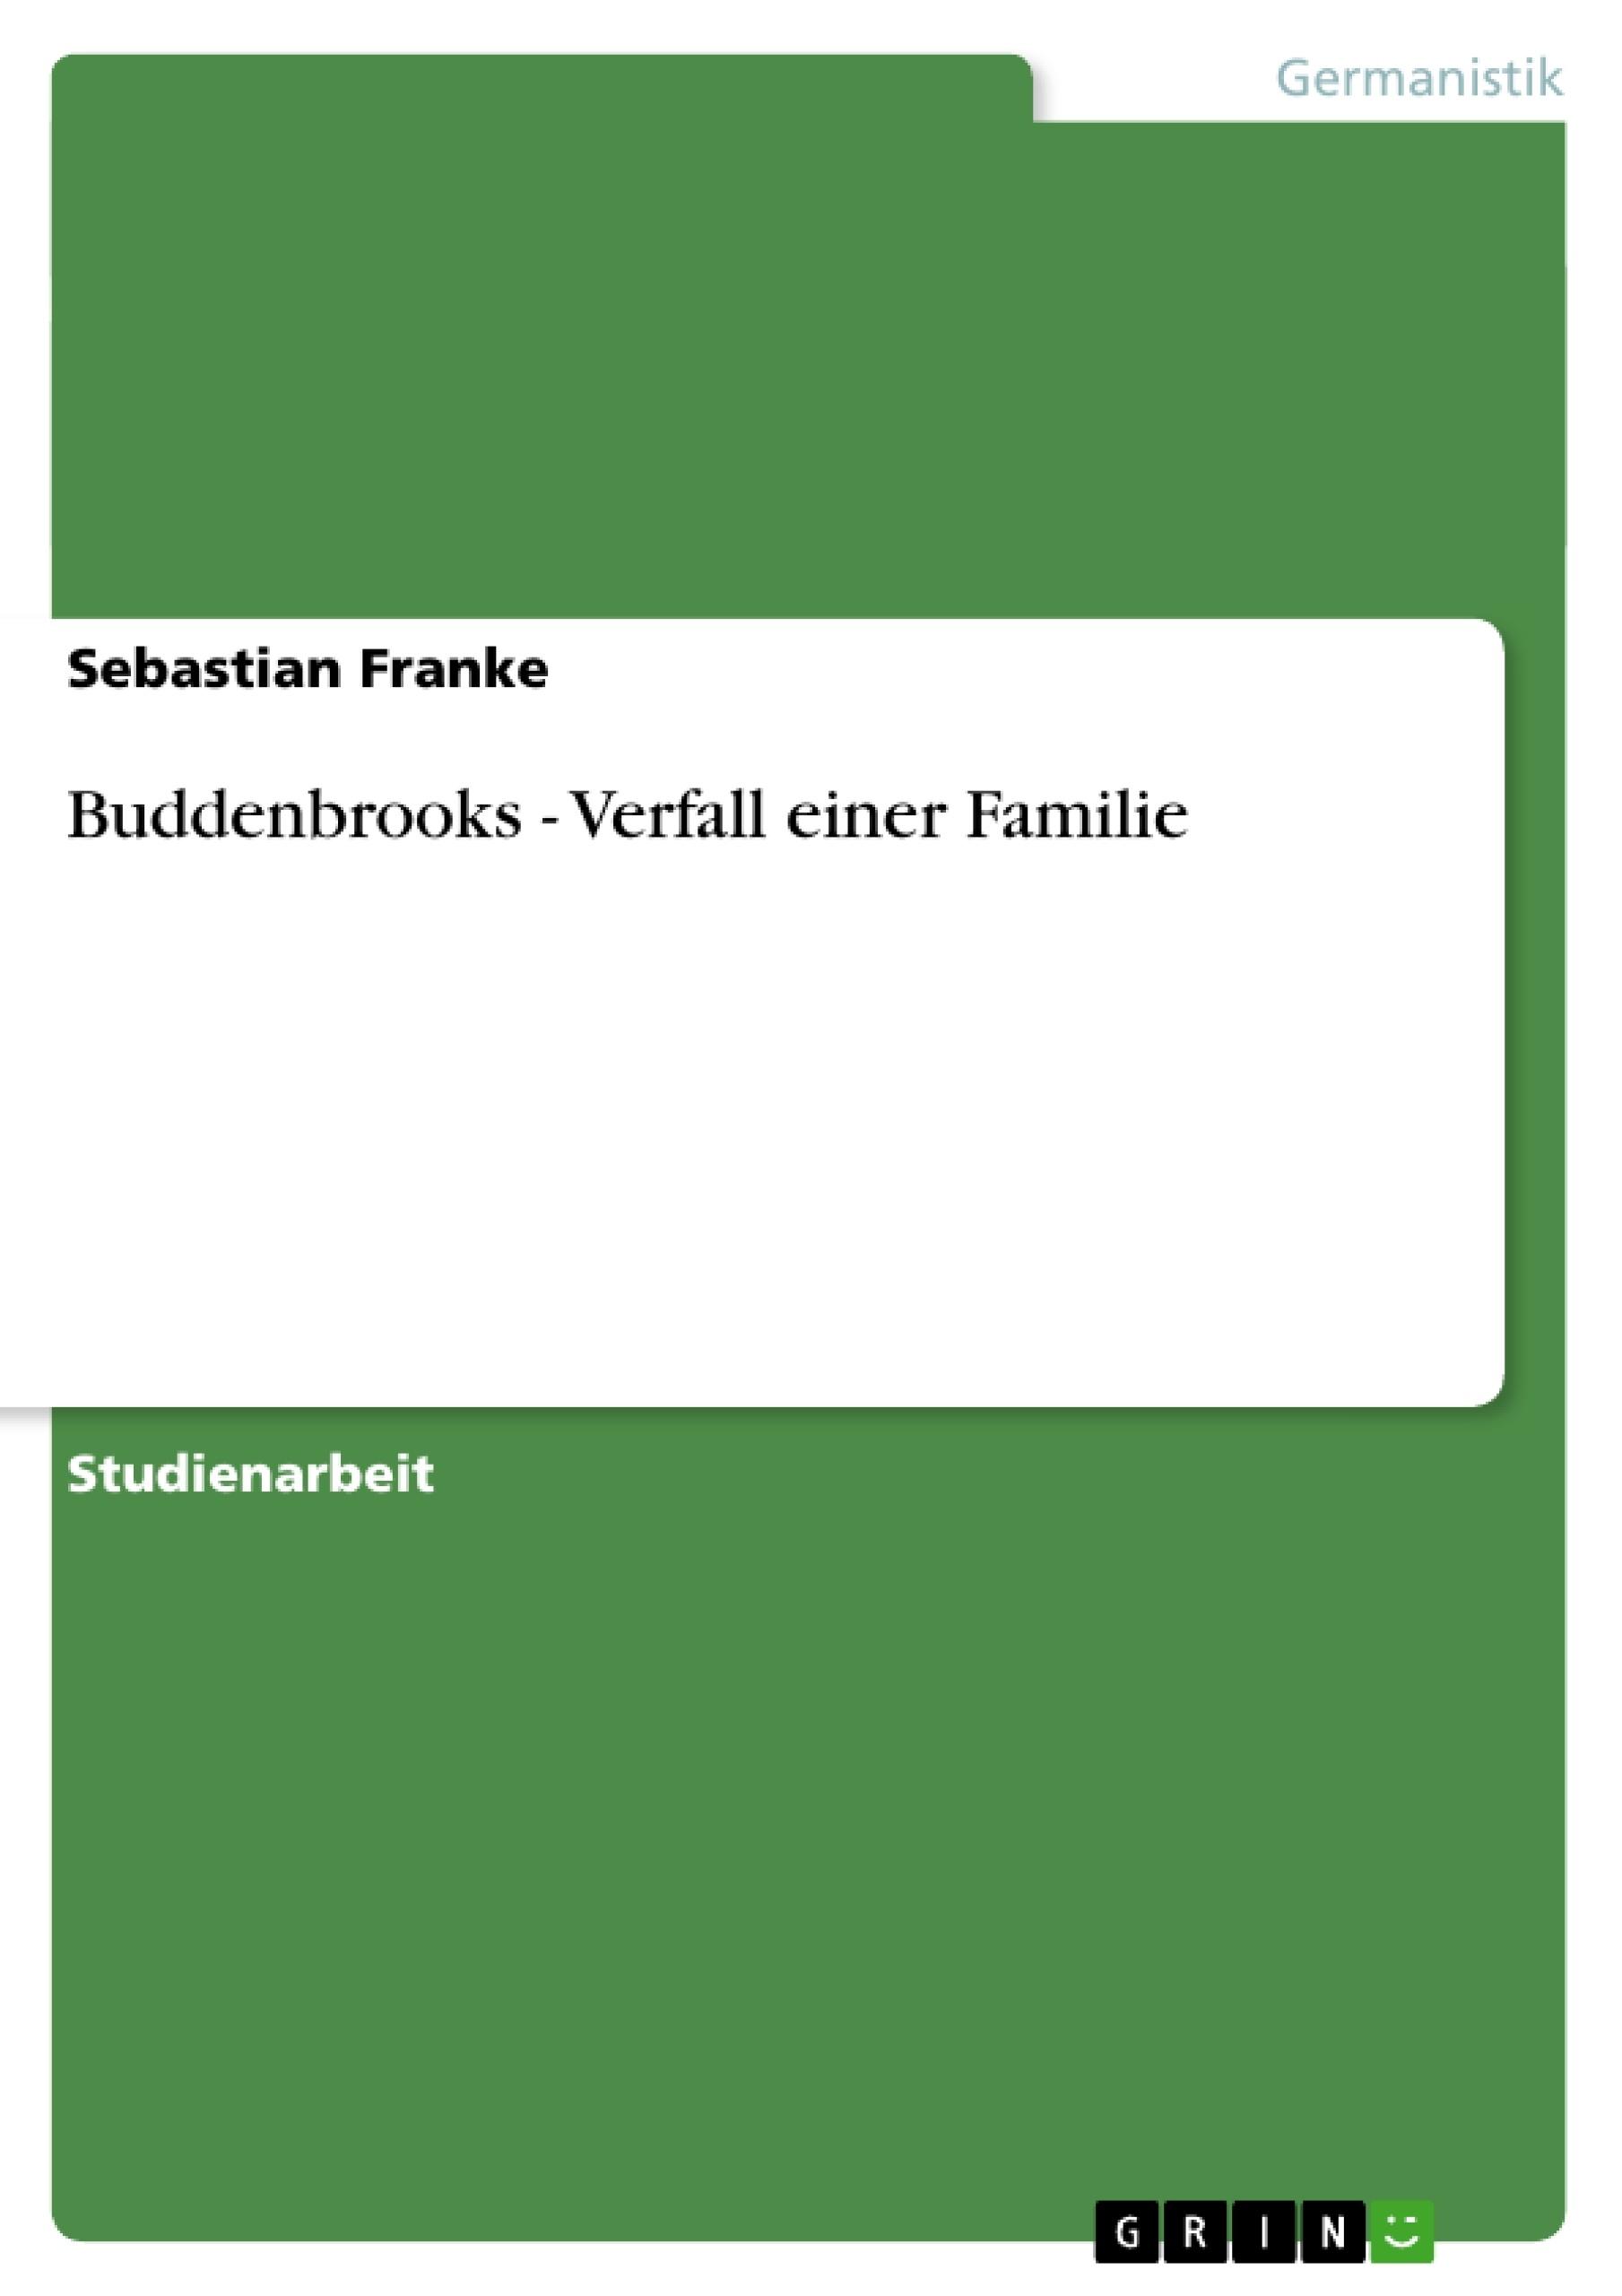 Titel: Buddenbrooks - Verfall einer Familie